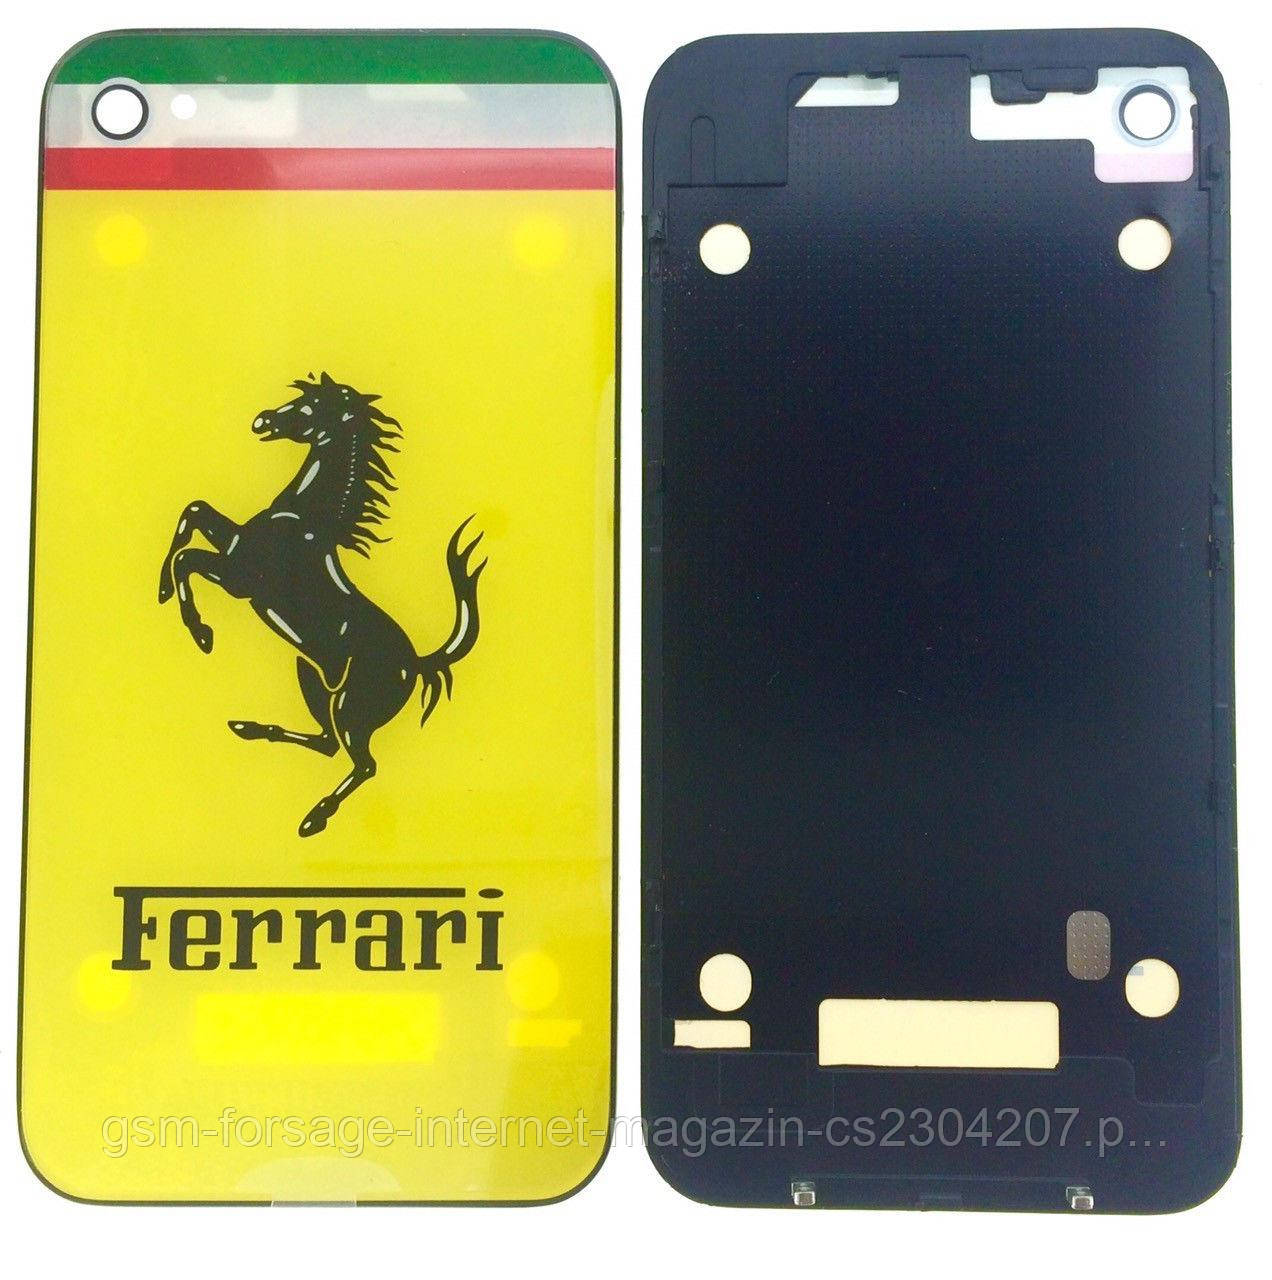 Крышка задняя iPhone 4 Yellow Ferrari Original Quality